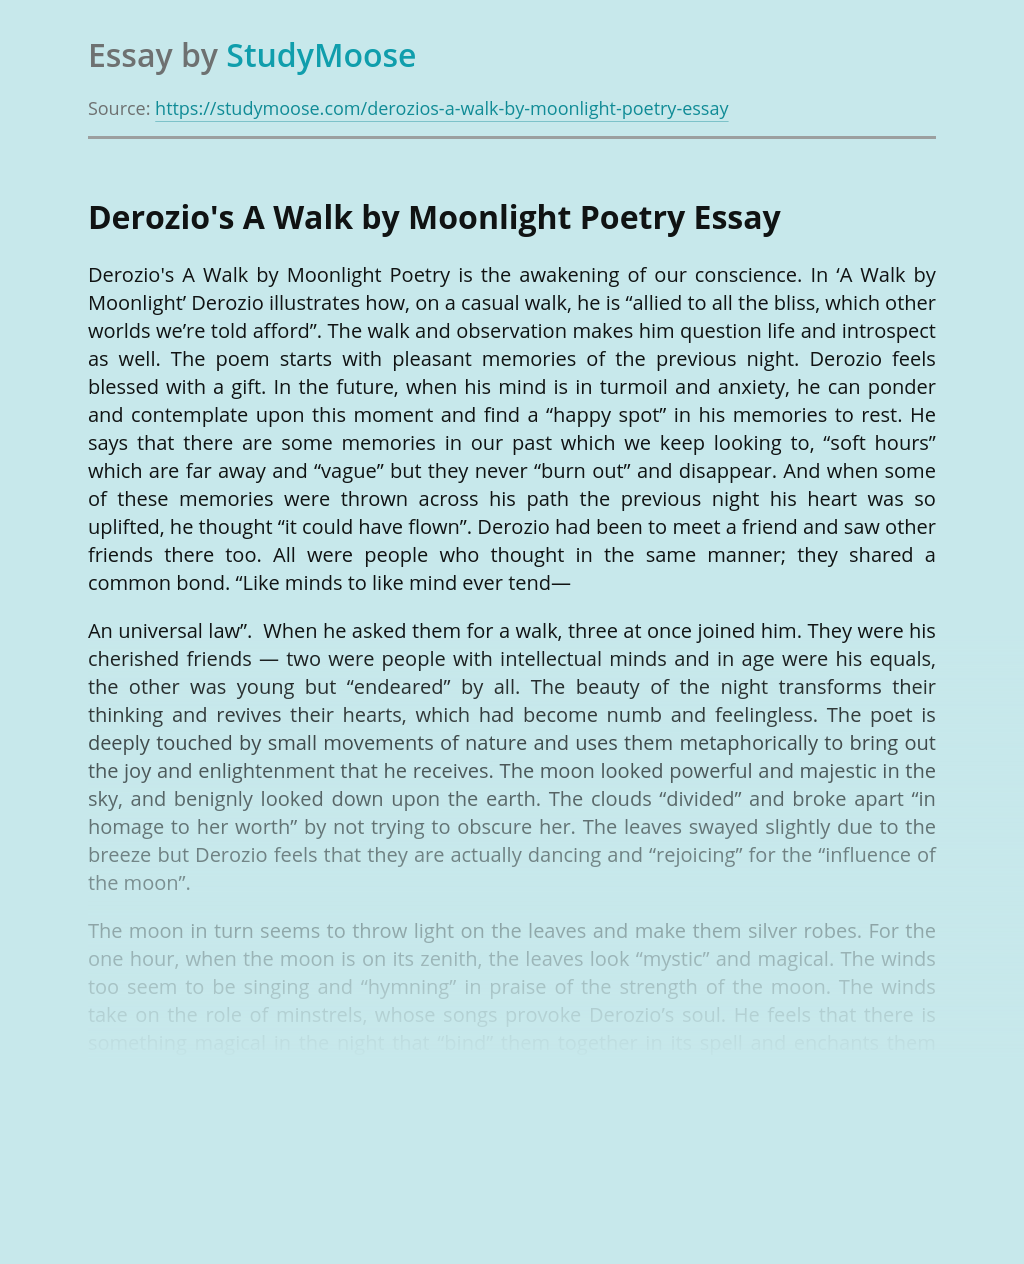 Derozio's A Walk by Moonlight Poetry